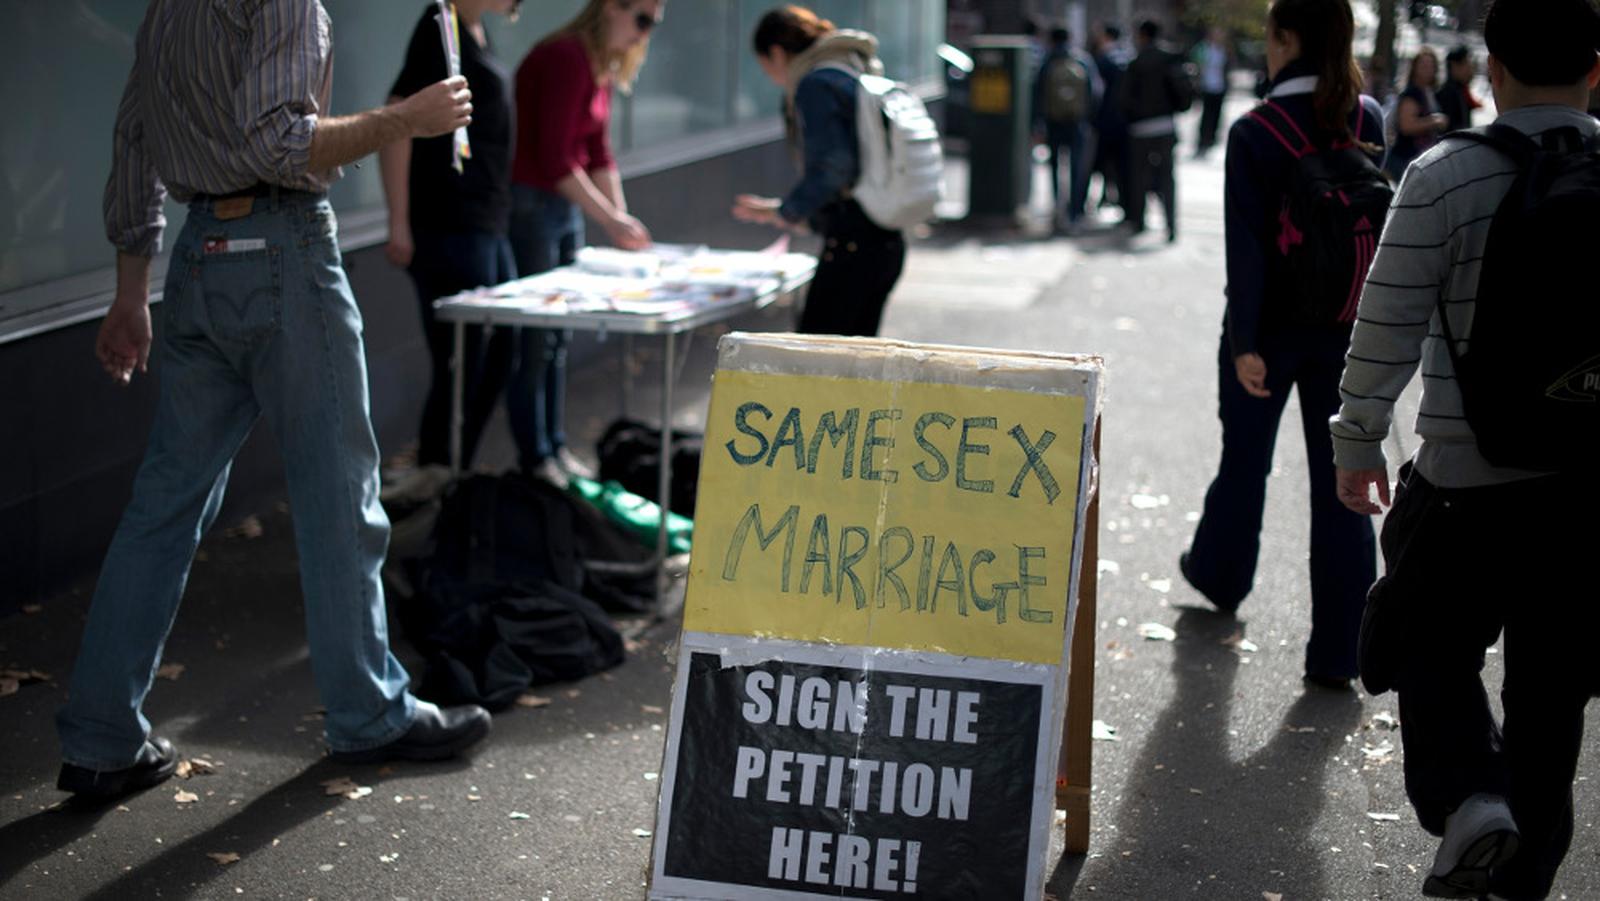 same sex marriage australian capital territory weather in Blackpool